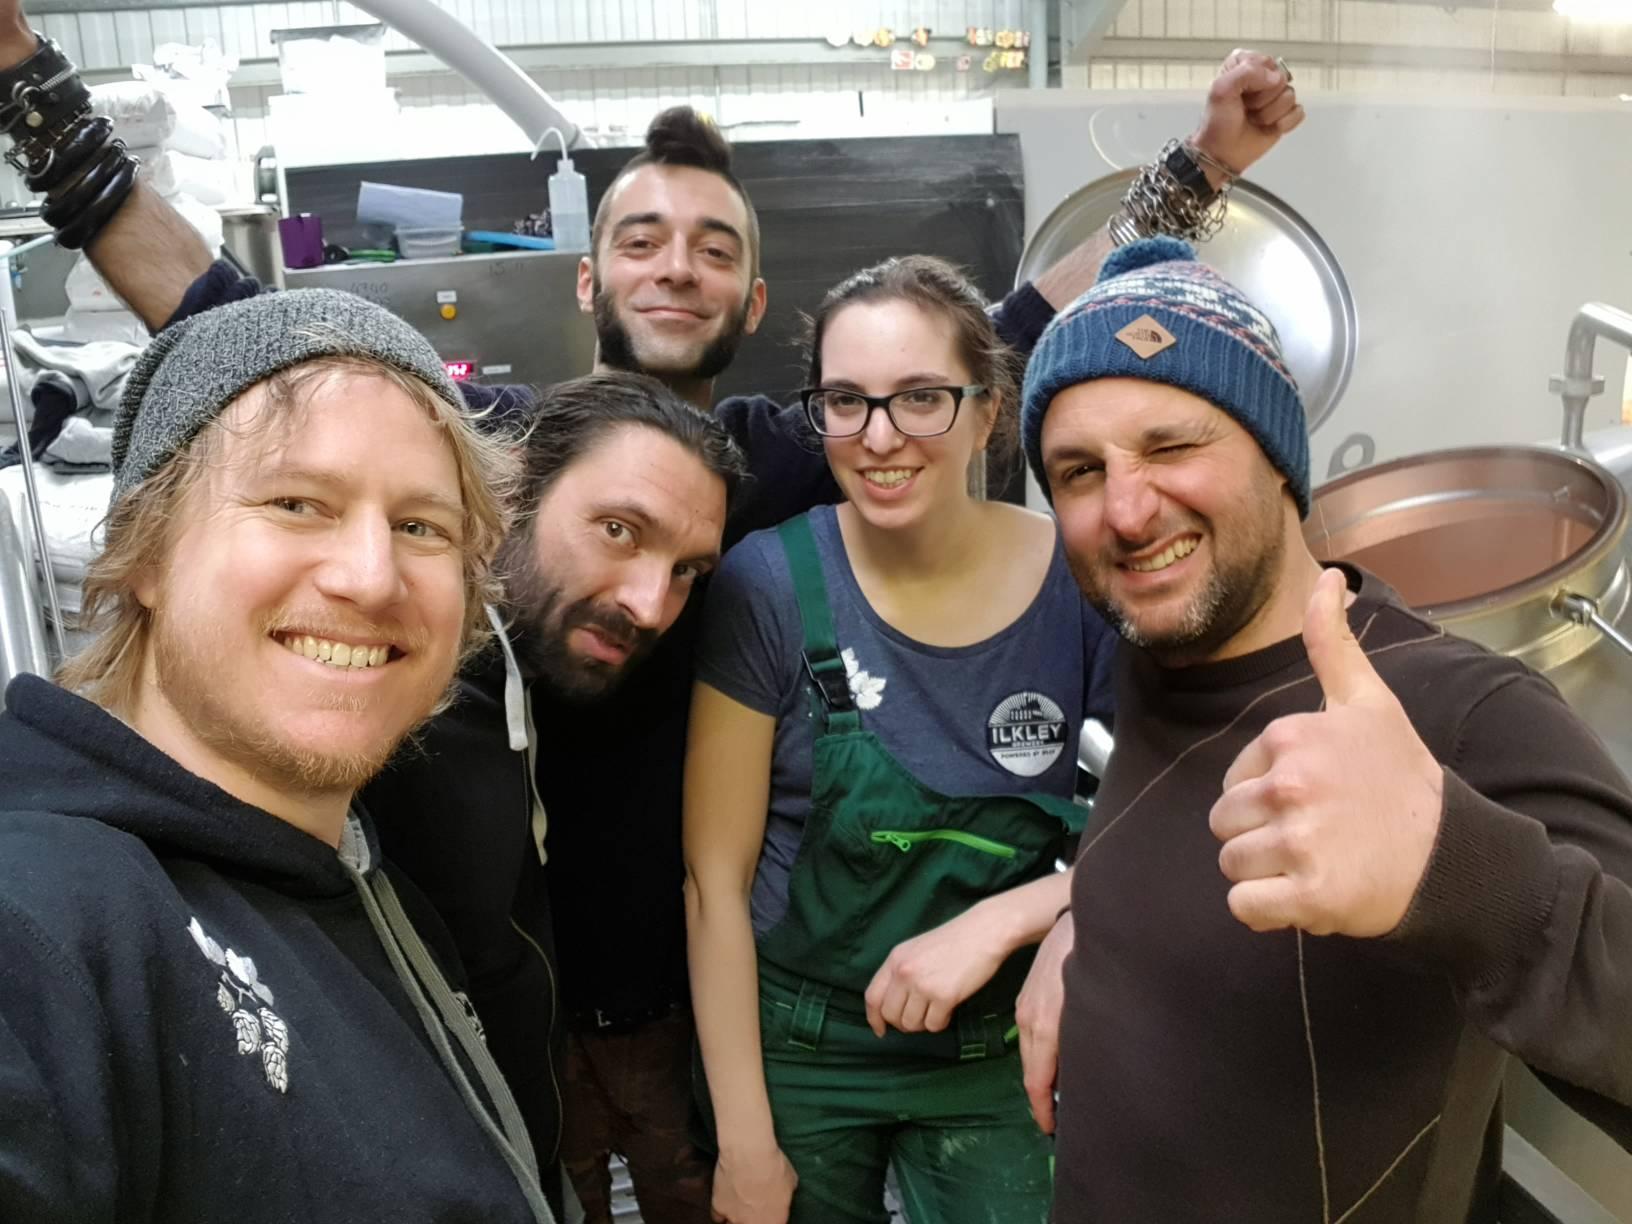 From L-R: Luke Raven (Ilkely), Allo (Canediguerra), Apo (Bruton), Ally (Ilkley) & Andrea (Bruton)